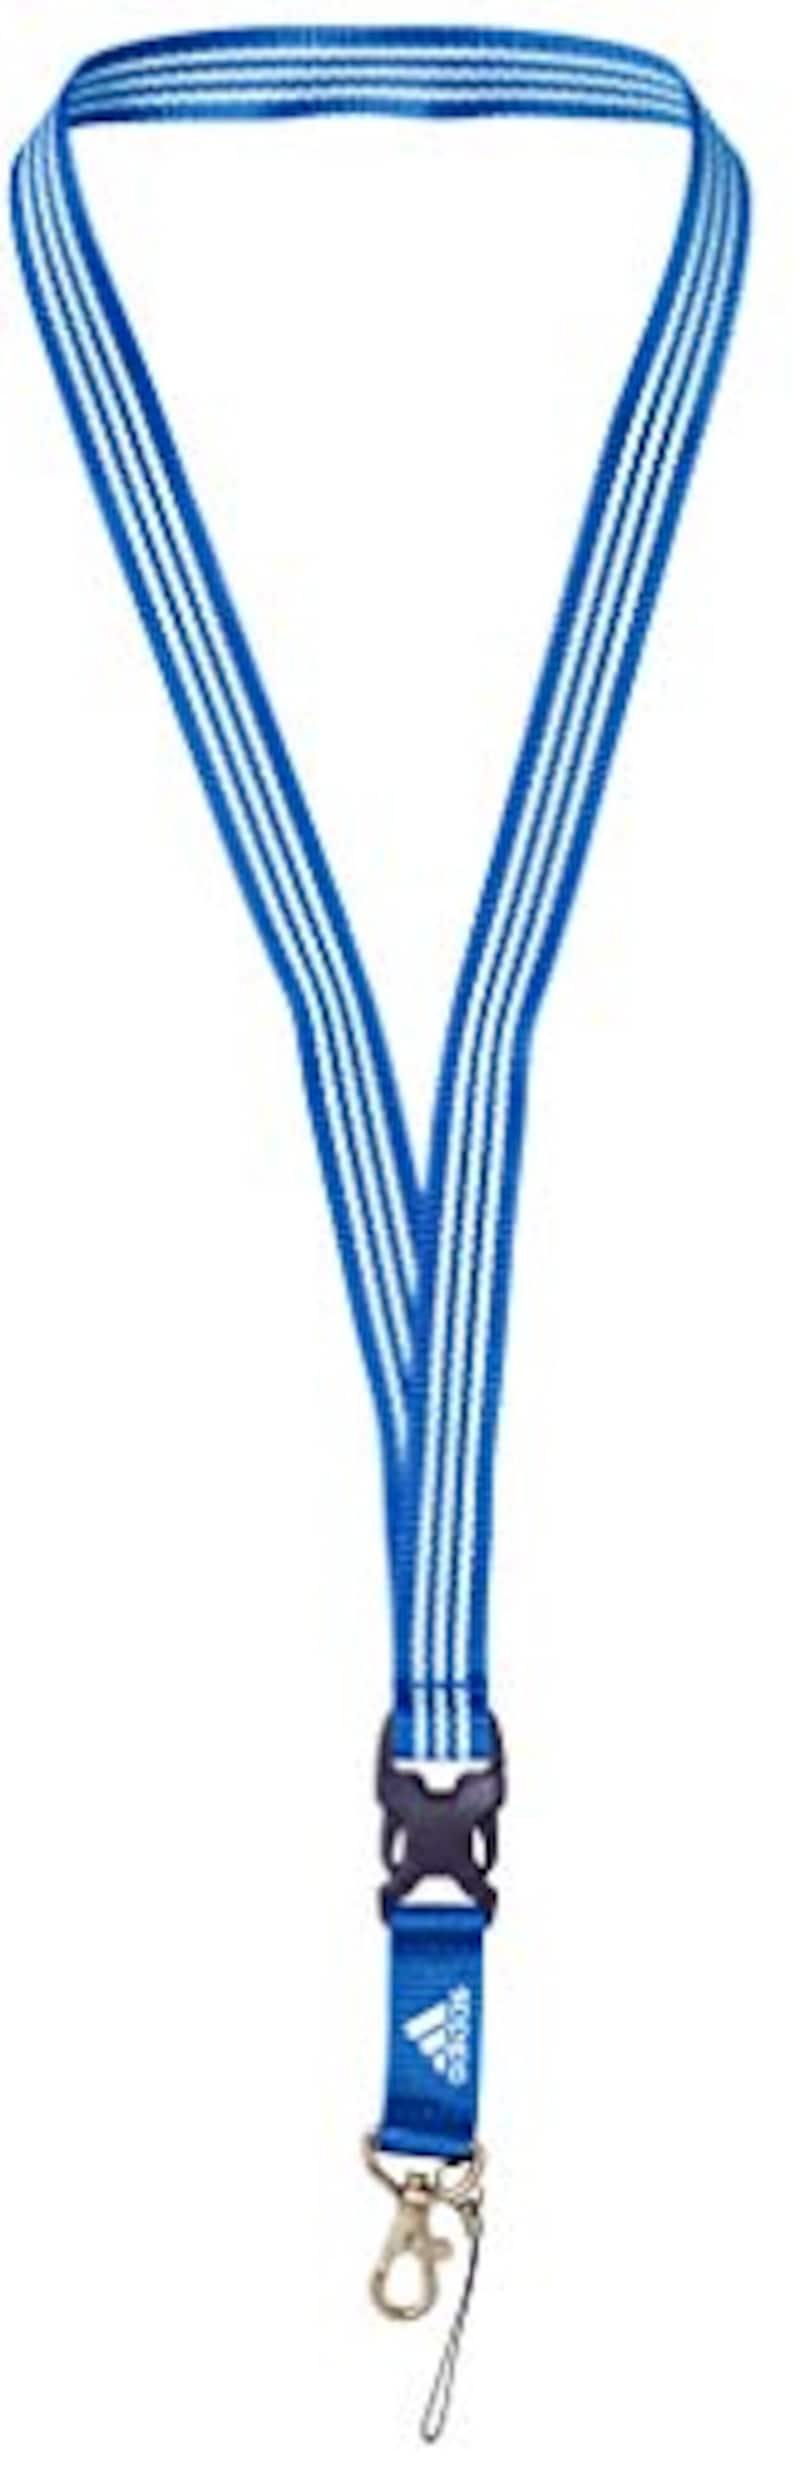 adidas(アディダス), 3ストライプス ランヤード ネックストラップ,FYP30-FS9052